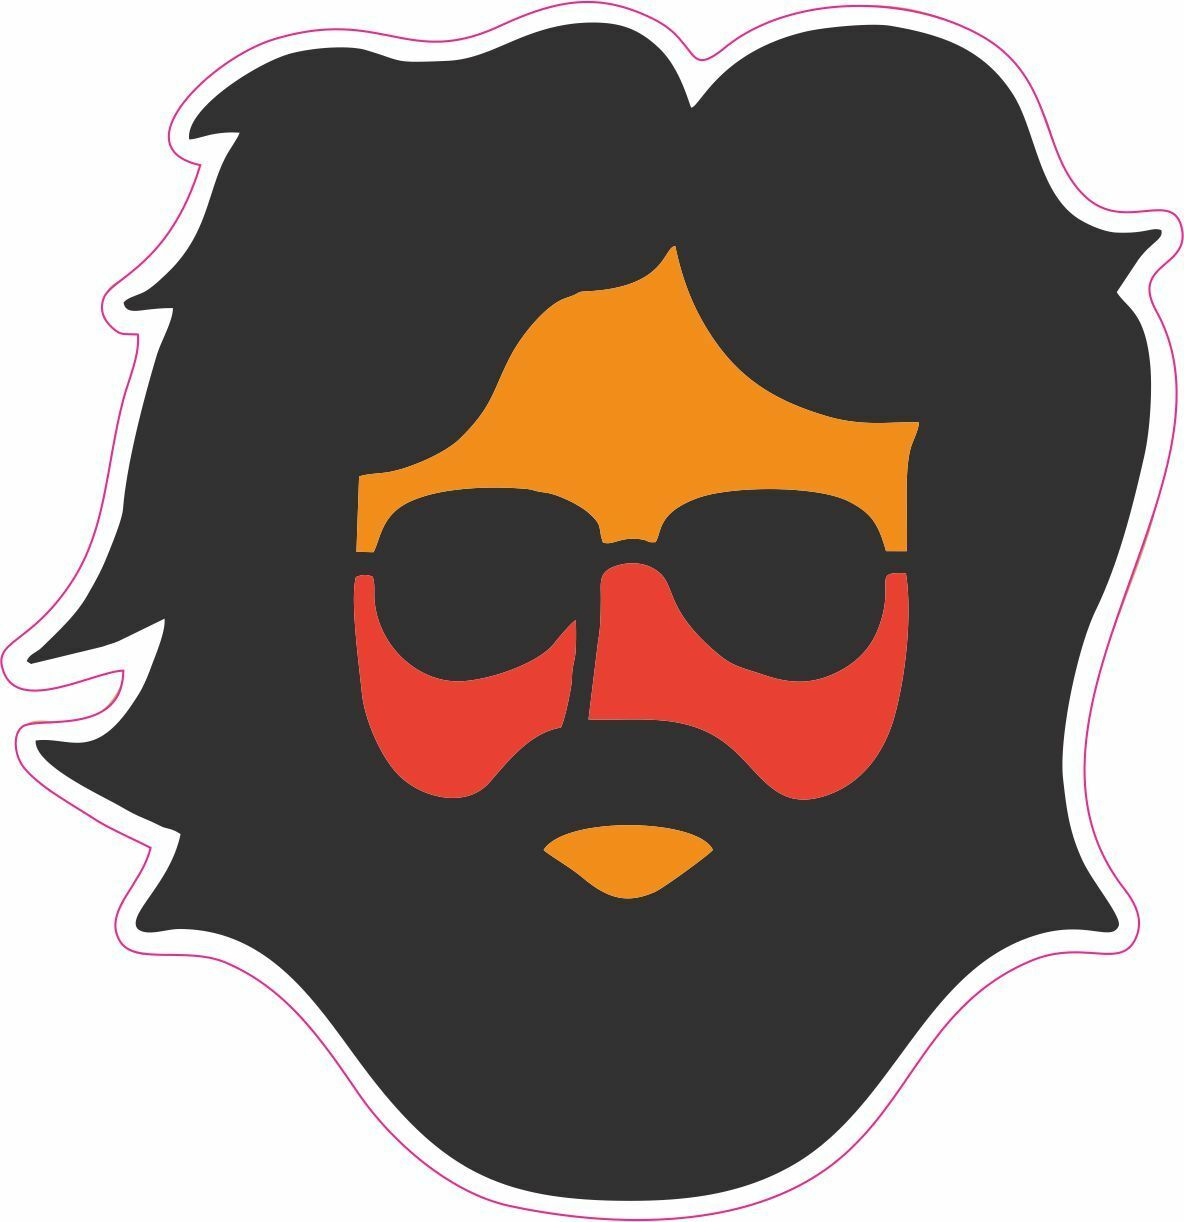 Grateful Dead Jerry Garcia Vinly Sticker Decal 4 inch